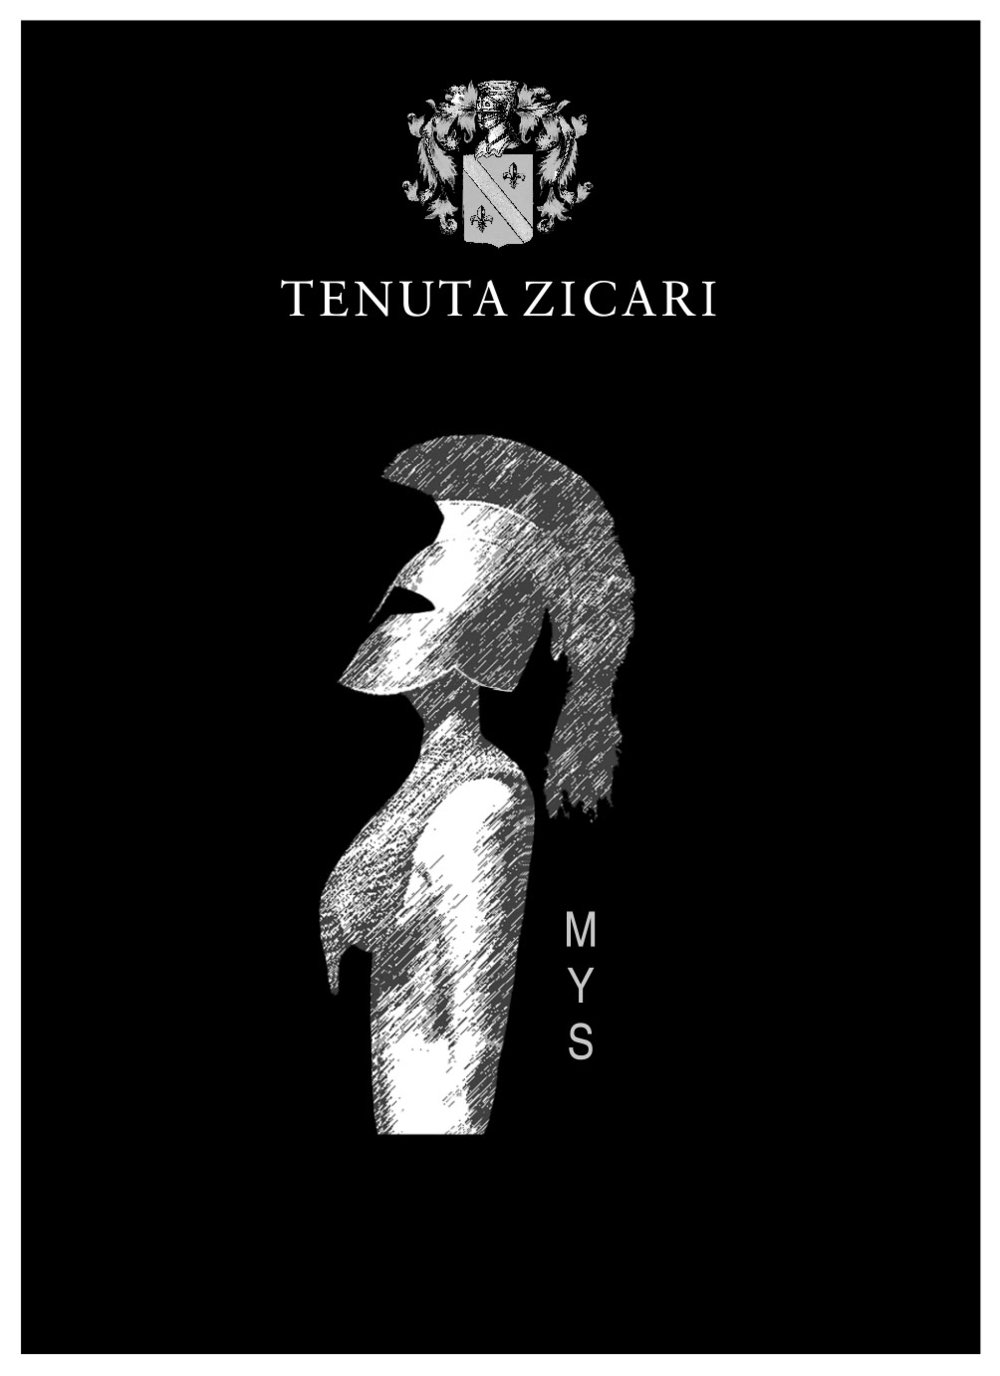 ZICARI etichetta MYS (def.85x117).tipografia.jpg